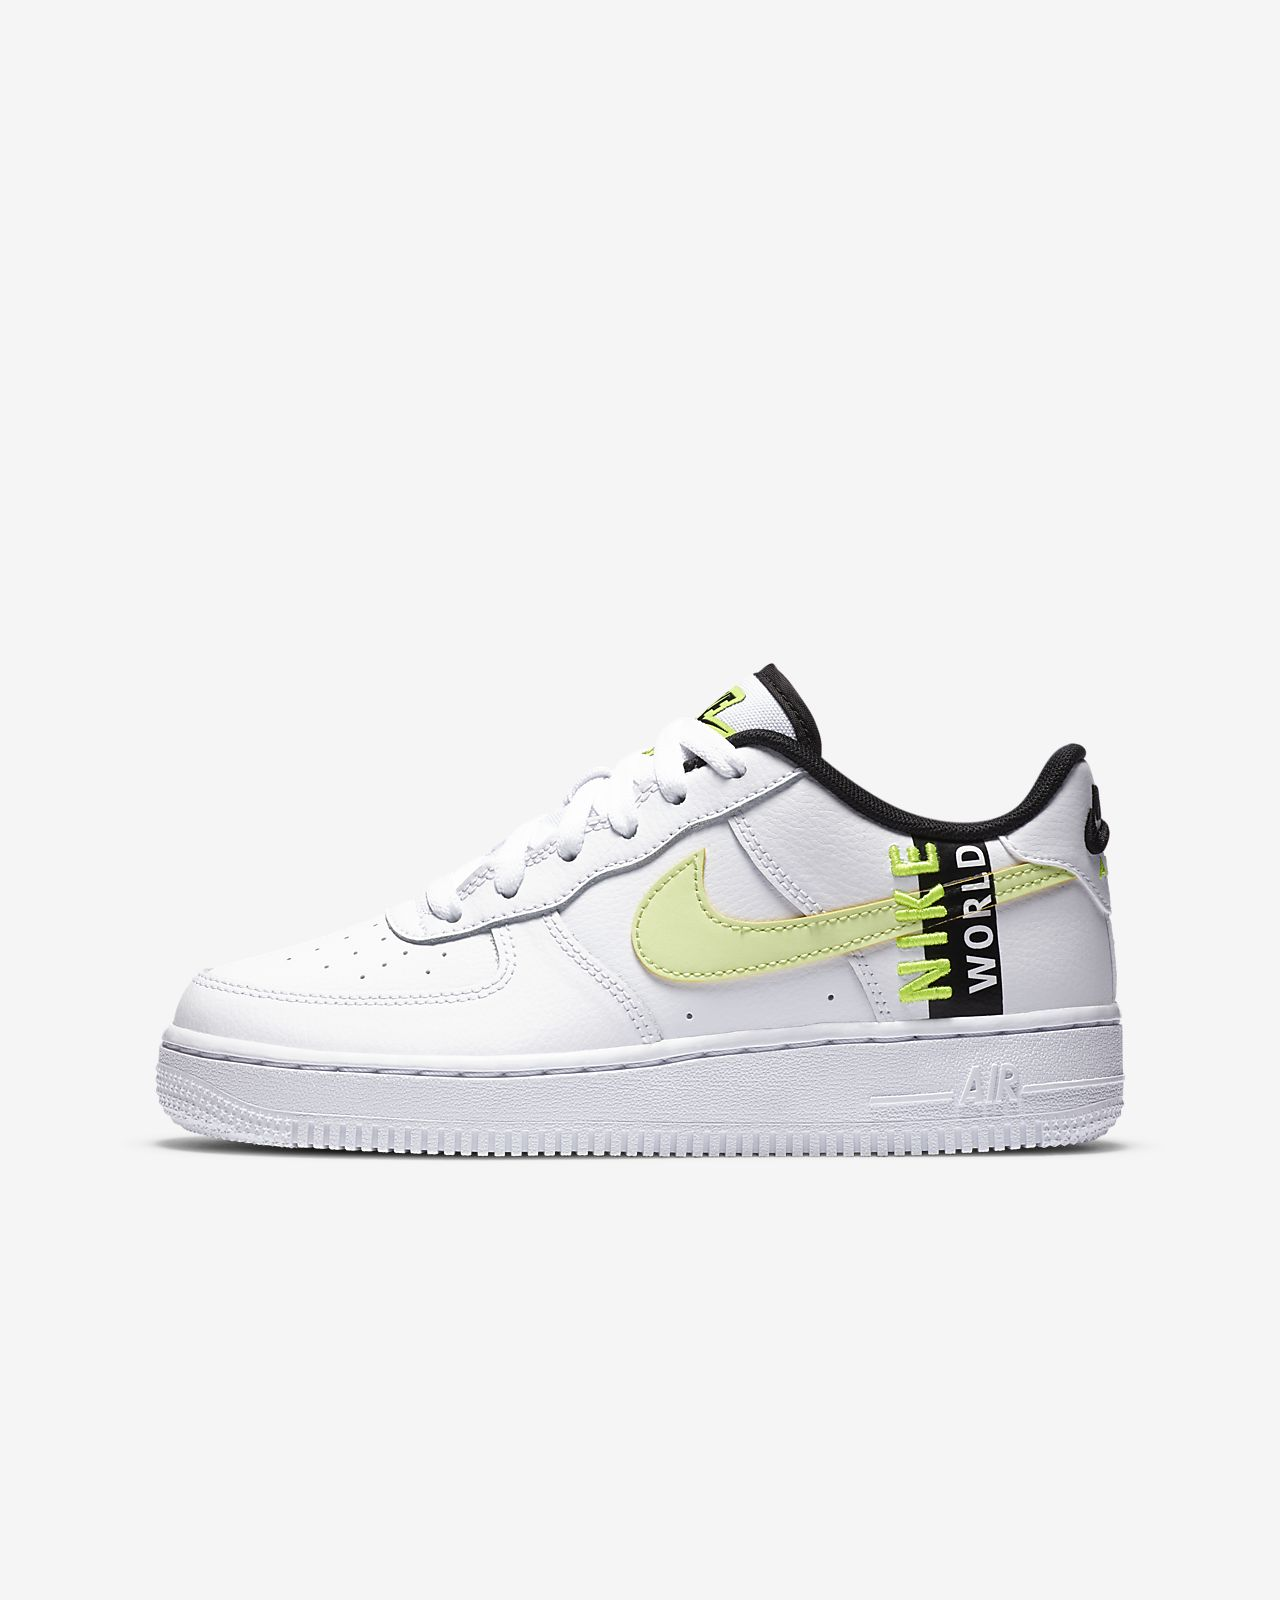 Nike Air Force 1 LV8 1 (GS) 大童运动童鞋